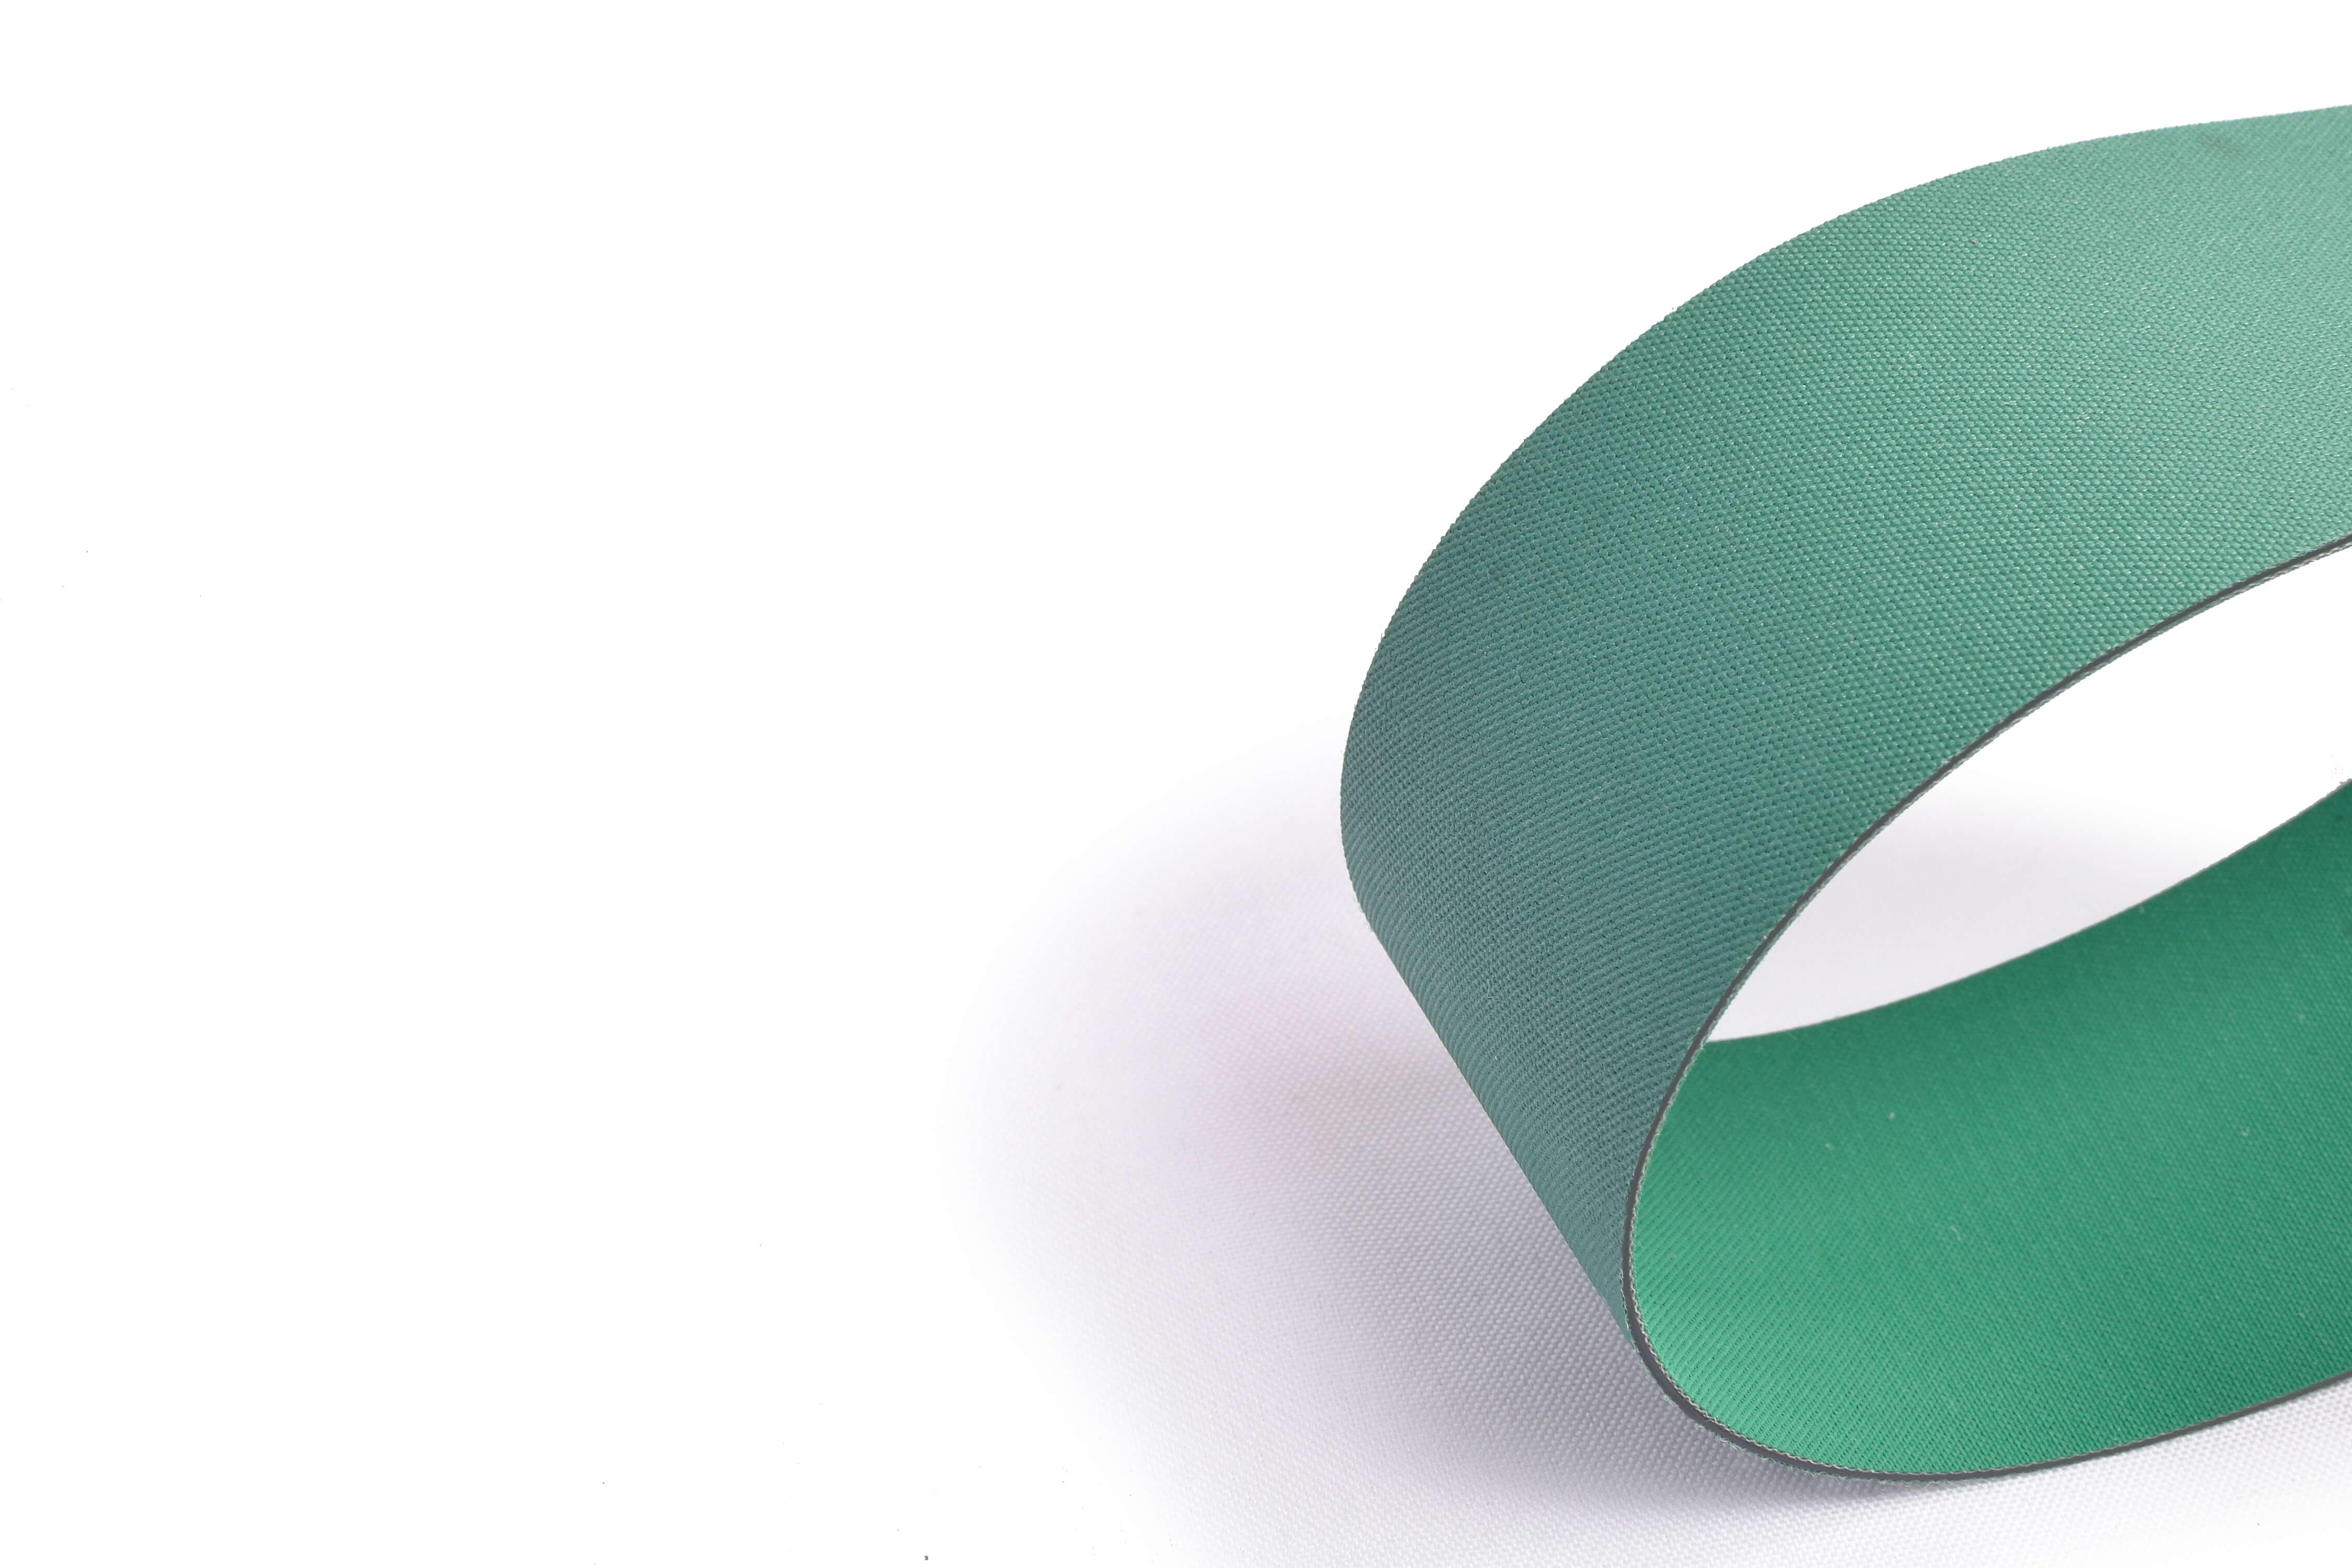 correia transmissão plana poliamida (nylon) tecido/borracha tipo F1